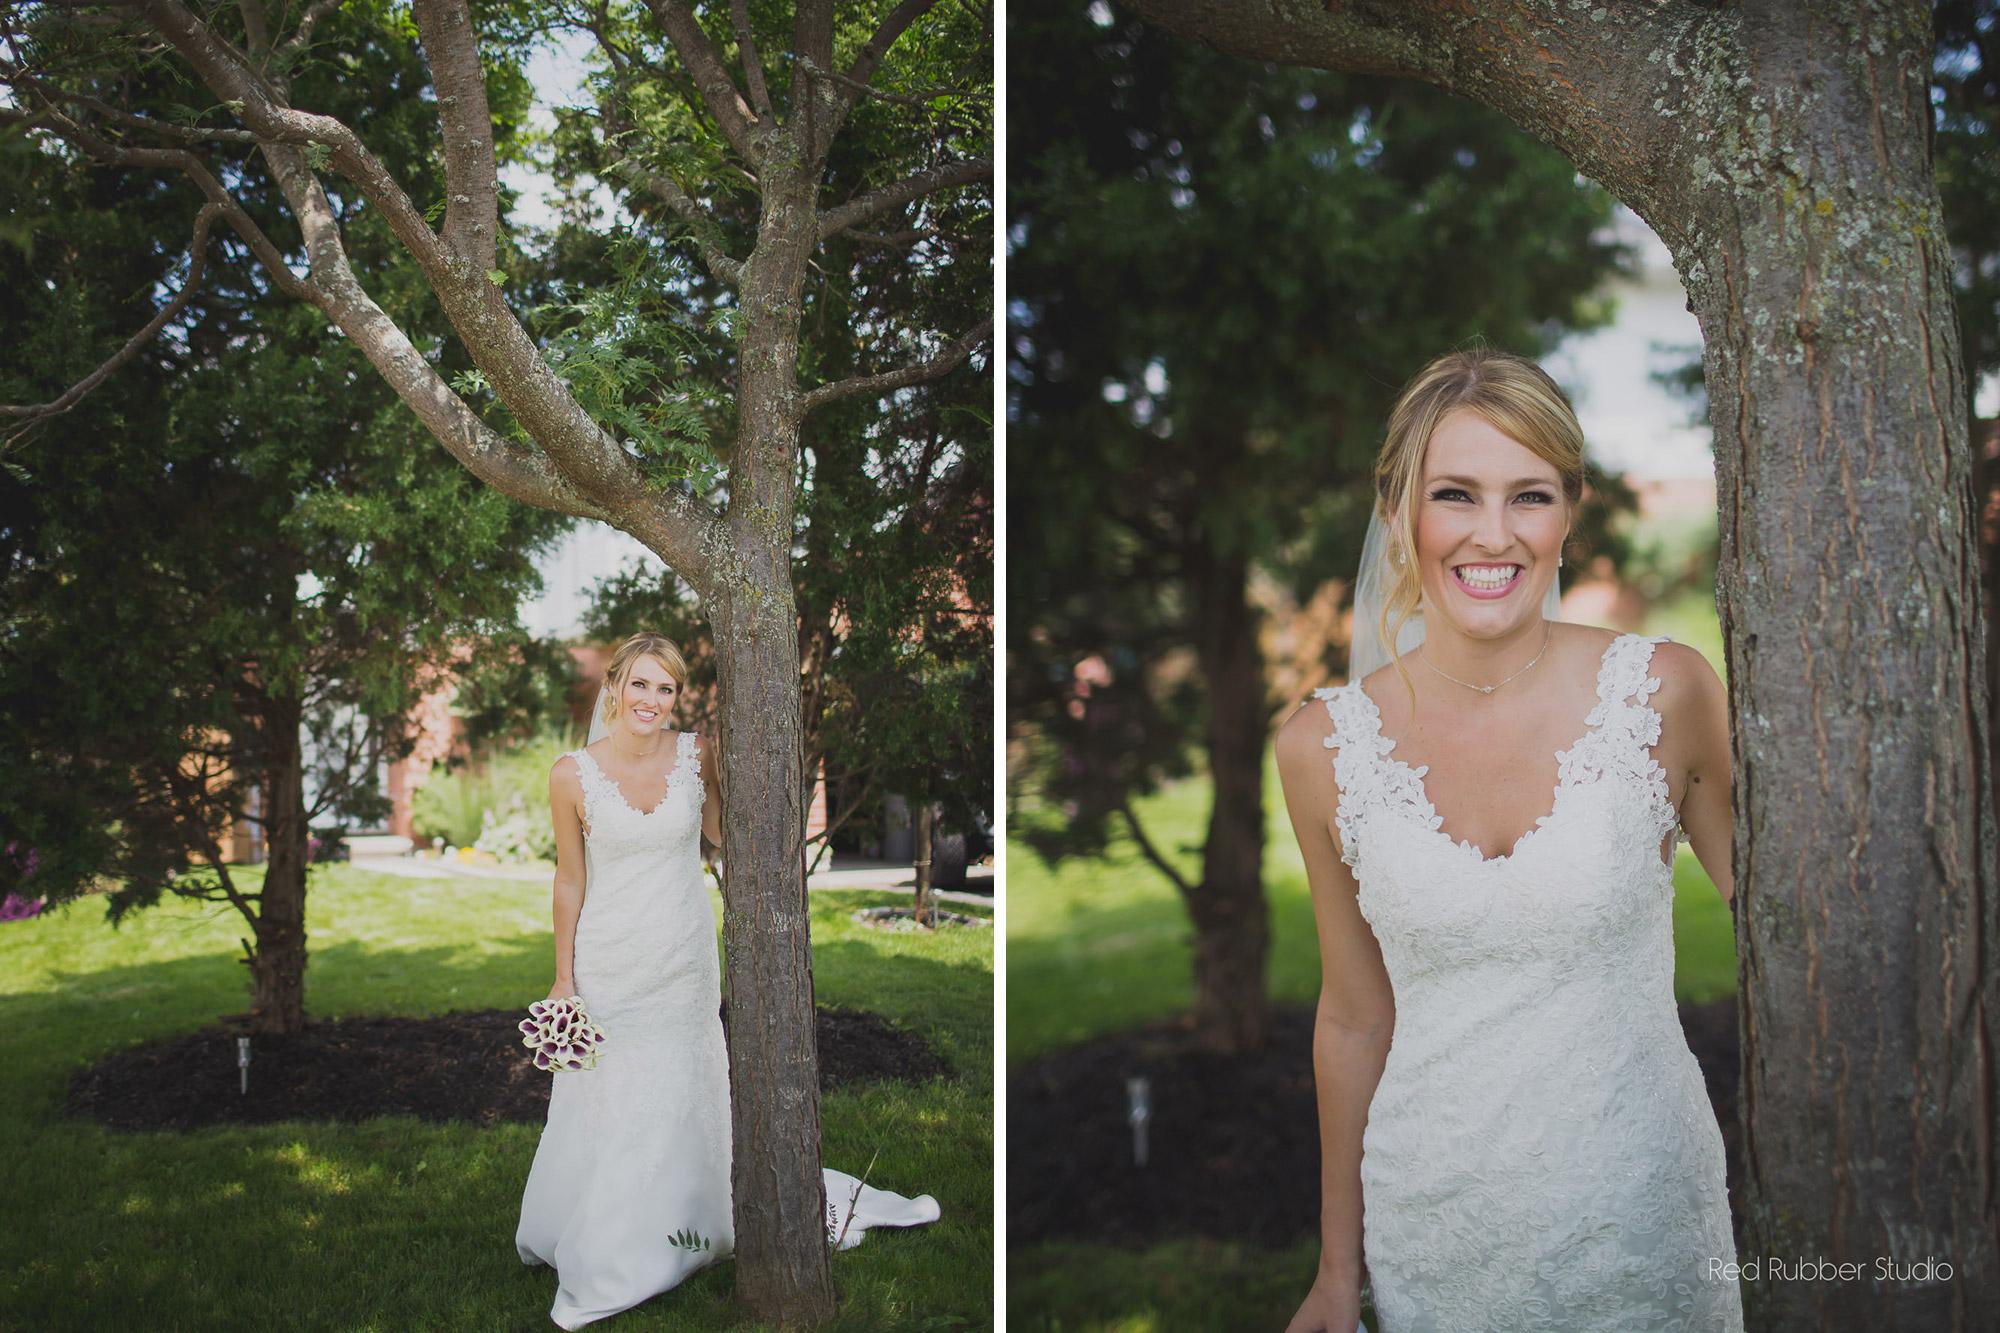 Bridal Necklace - Backdrop Necklace - Bridal Jewelry